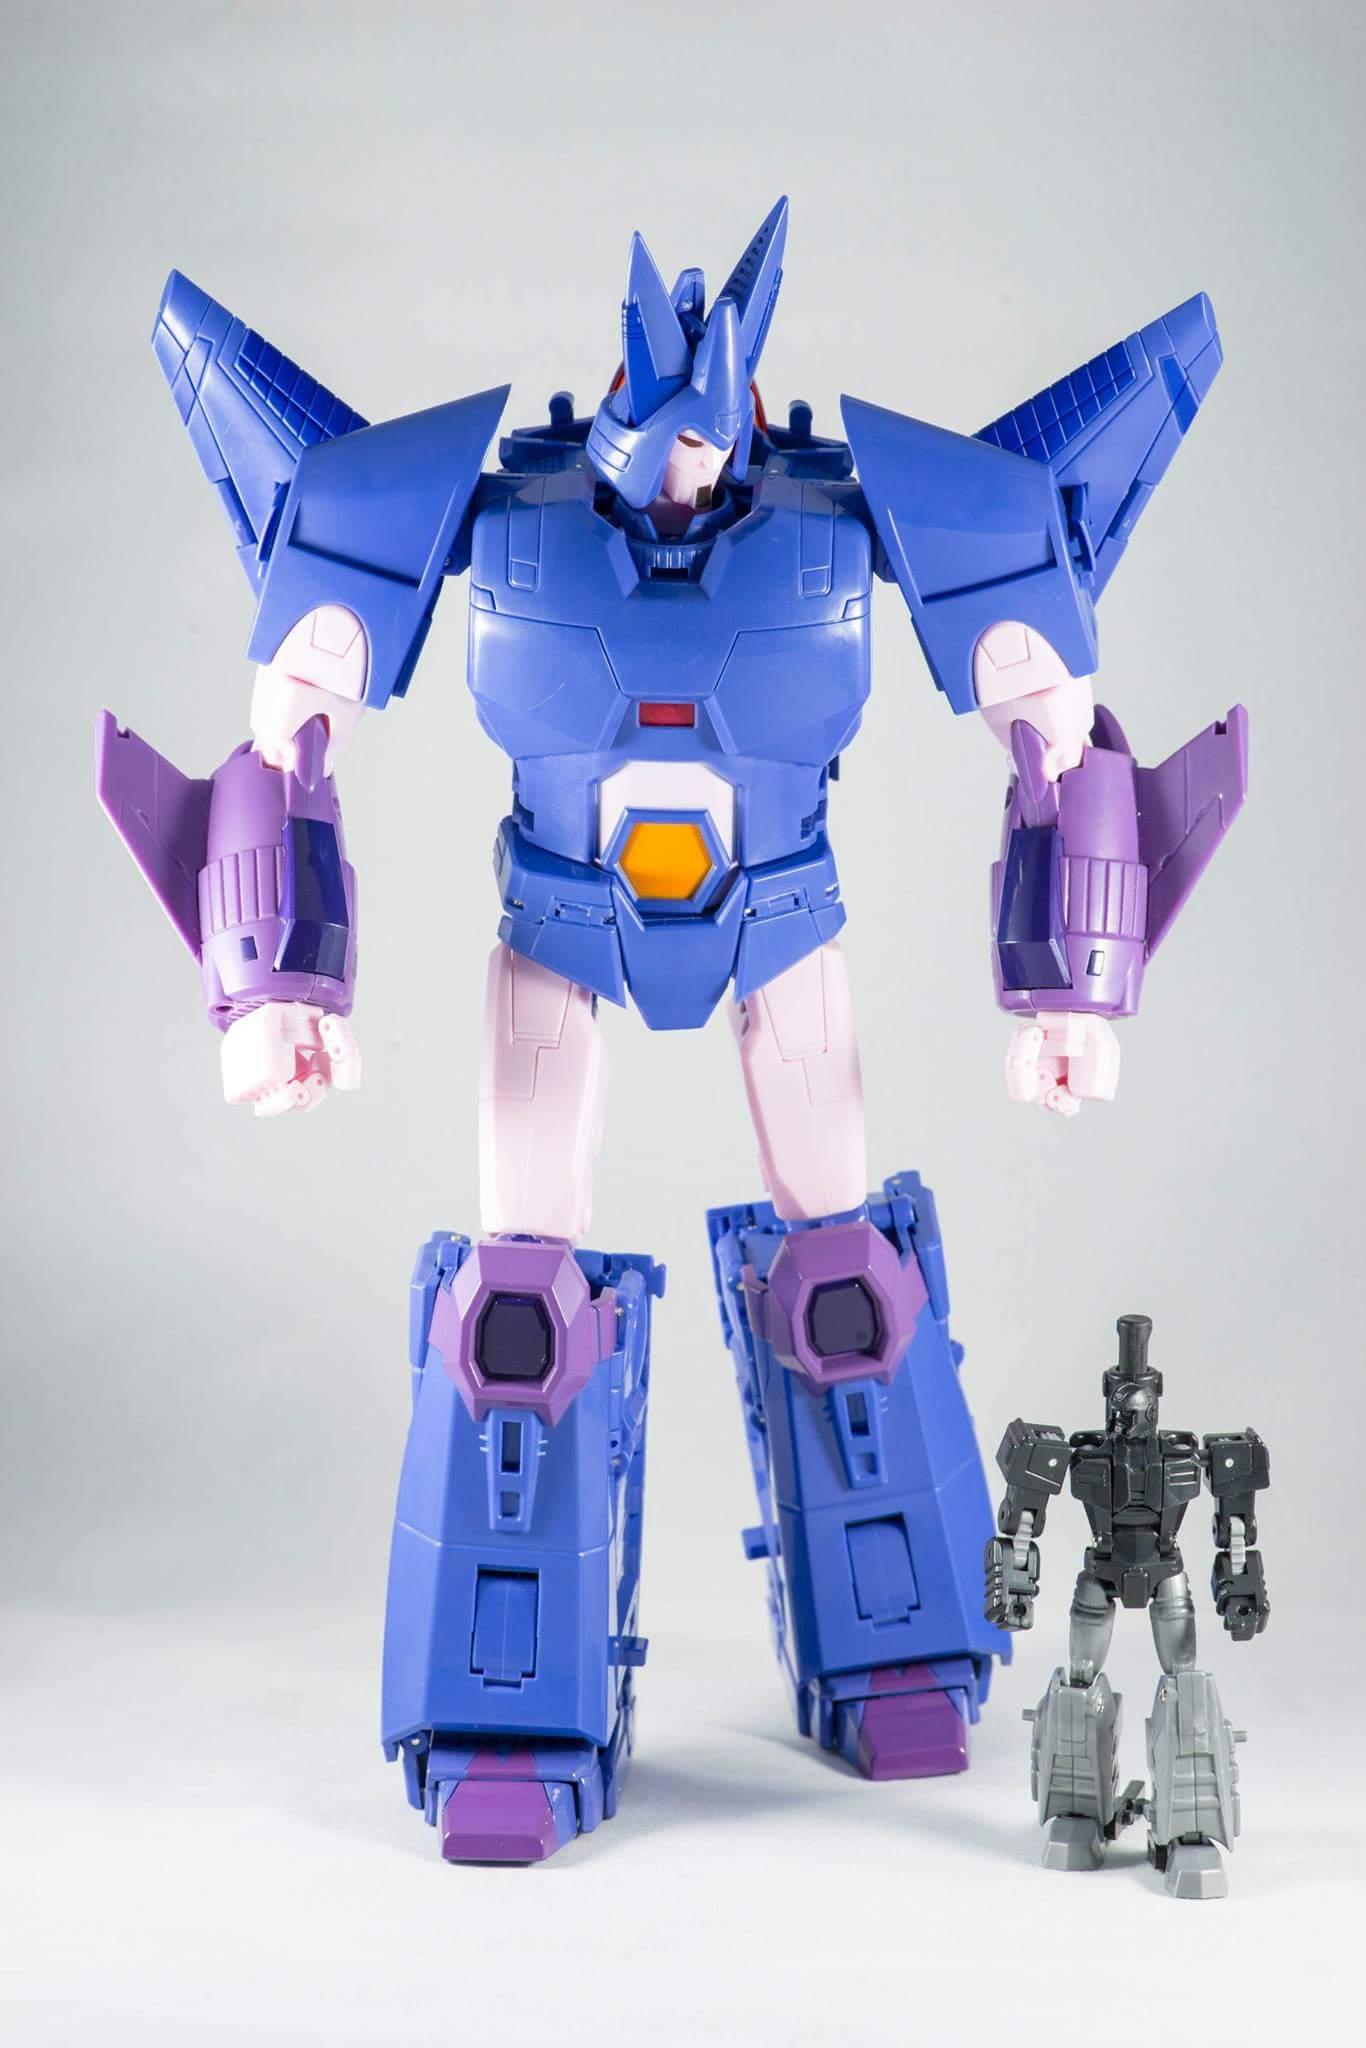 [X-Transbots] Produit Tiers - MX-III Eligos - aka Cyclonus - Page 3 7CMop1QK